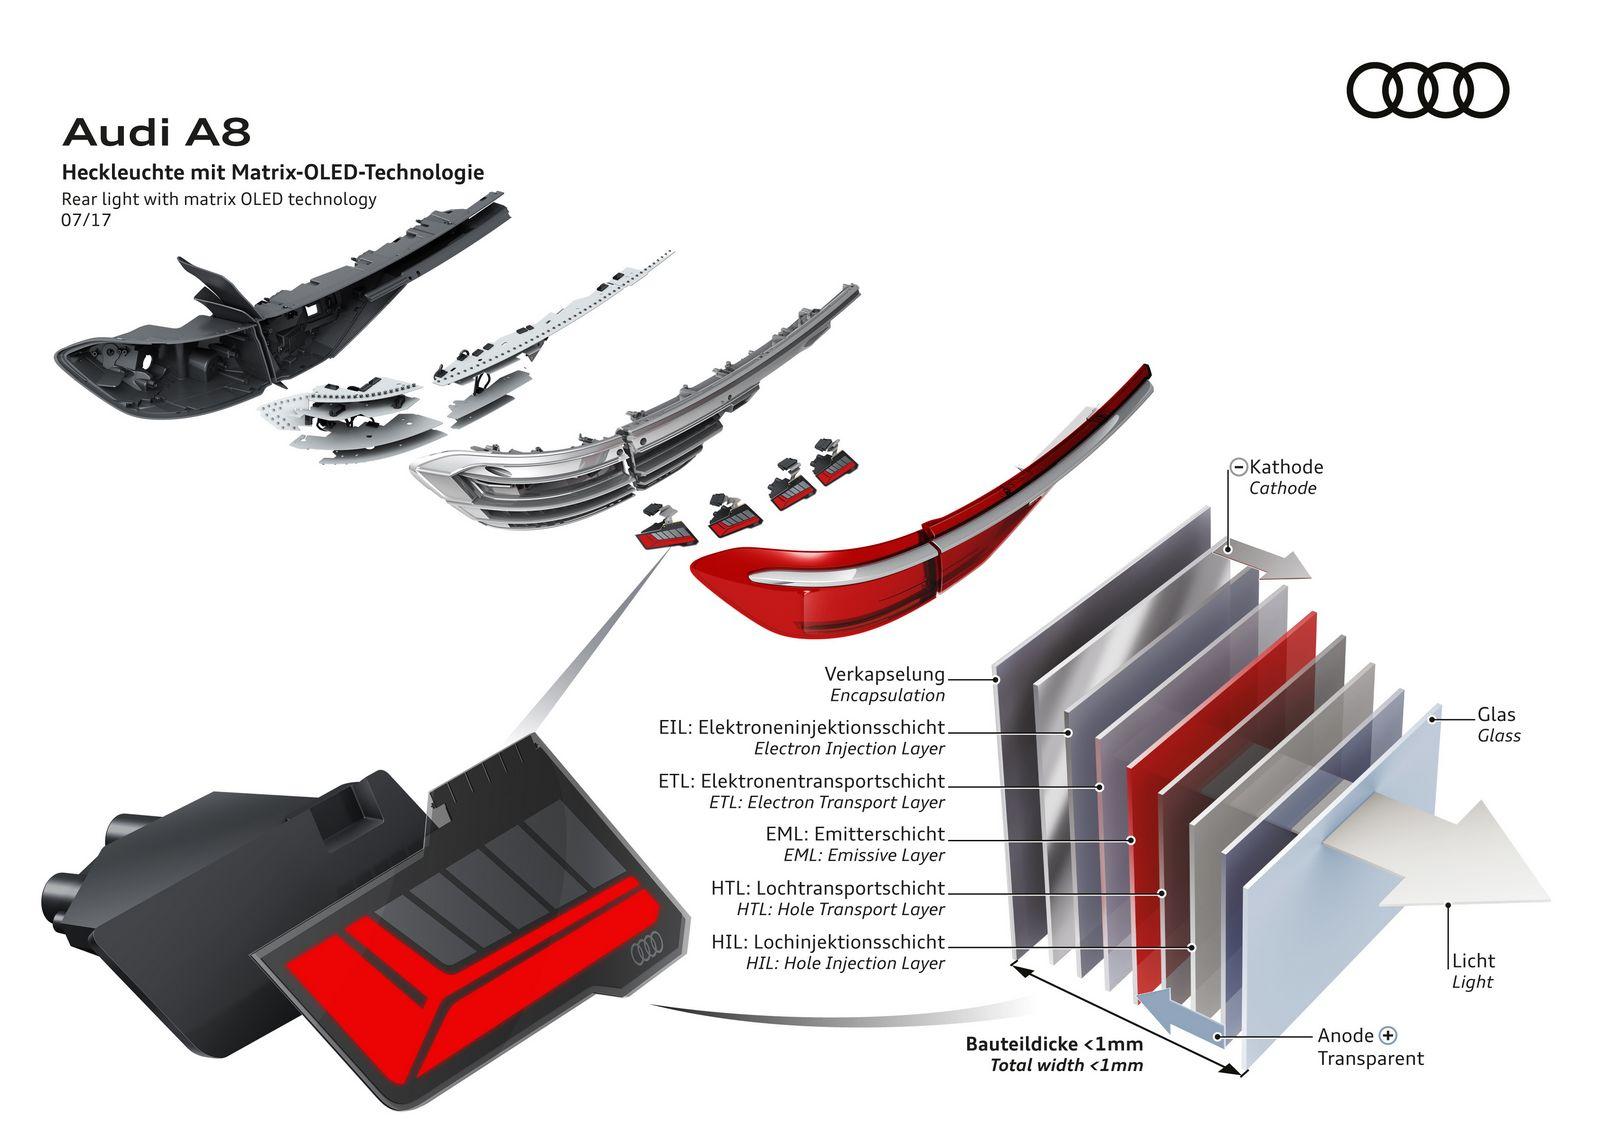 Rear light with matrix OLED technology